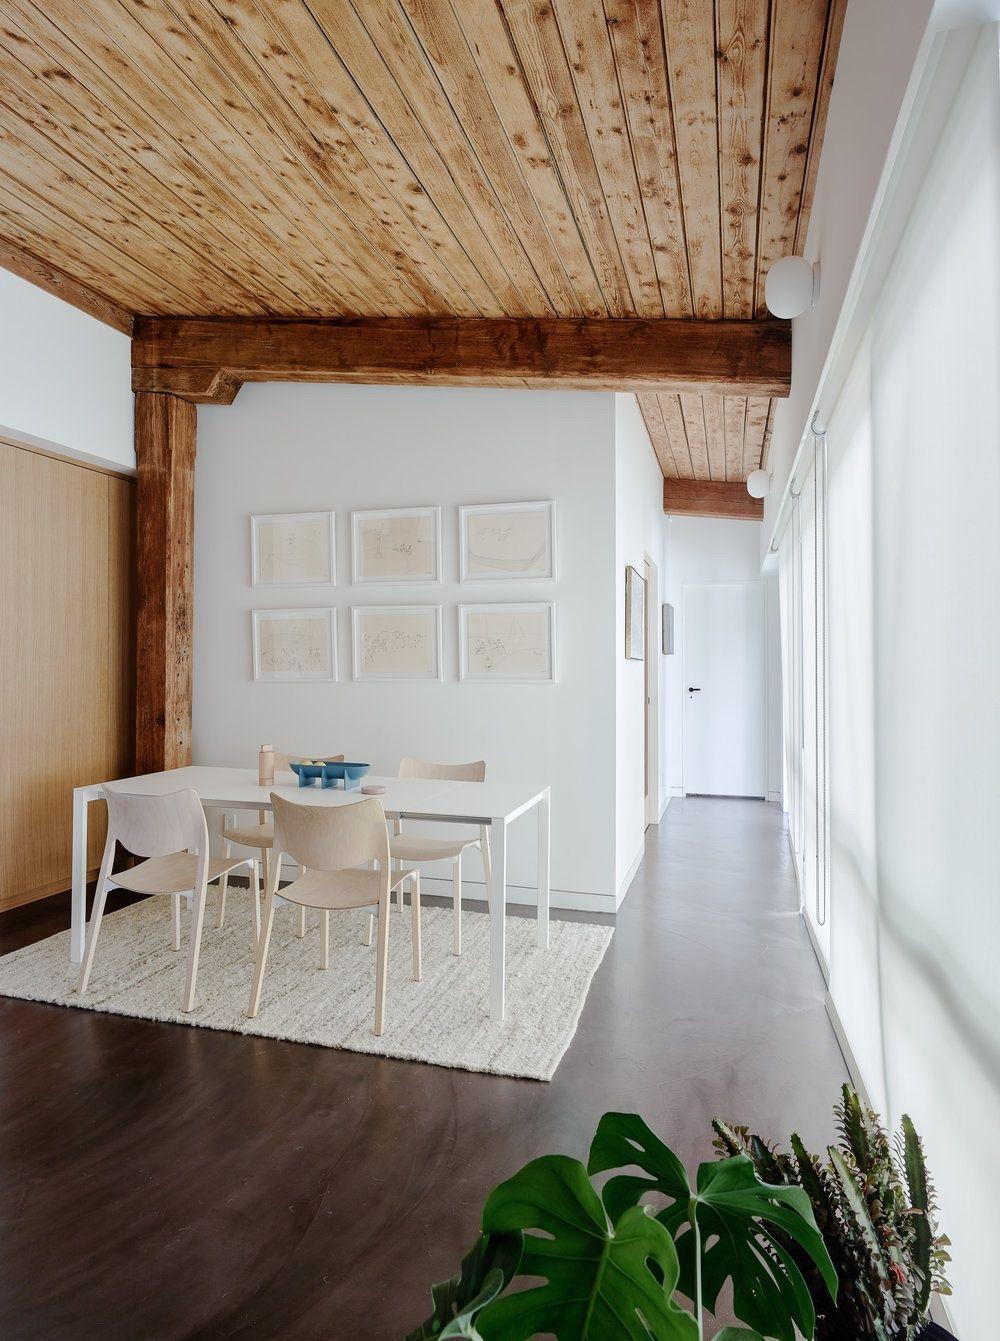 Gowanus Loft is a minimalist interior located